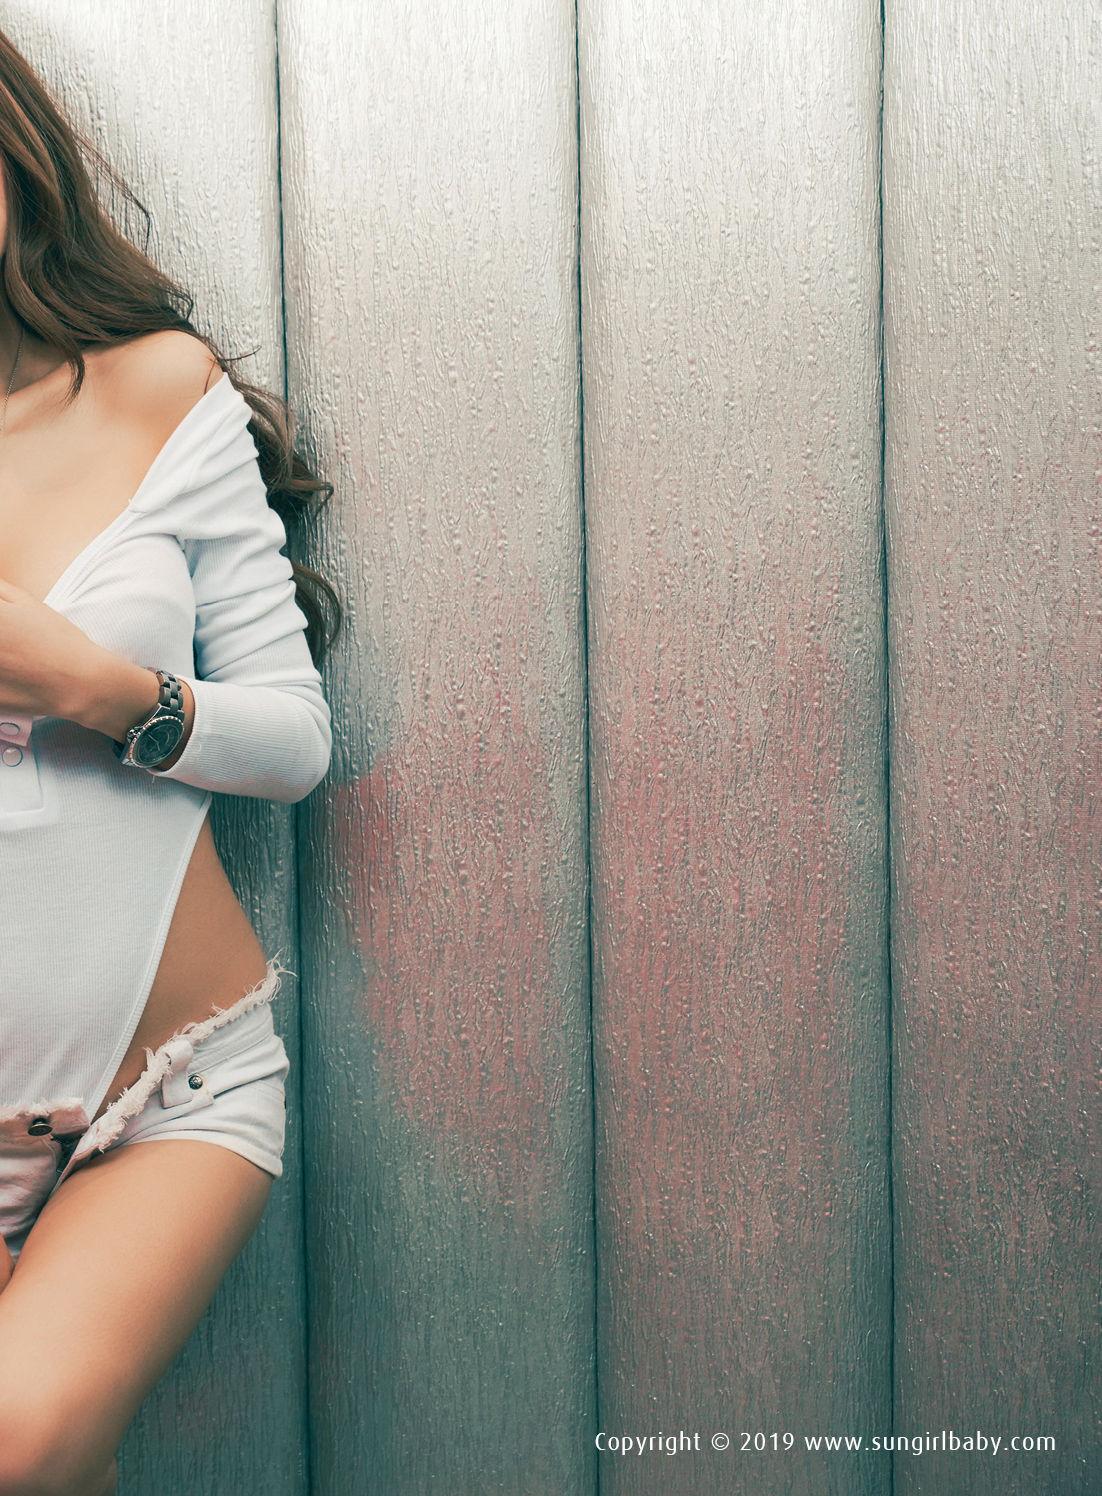 VOL.1255 [阳光宝贝]热裤女神魅惑美女:陈妘安(小雯Ivy)超高清个人性感漂亮大图(35P)